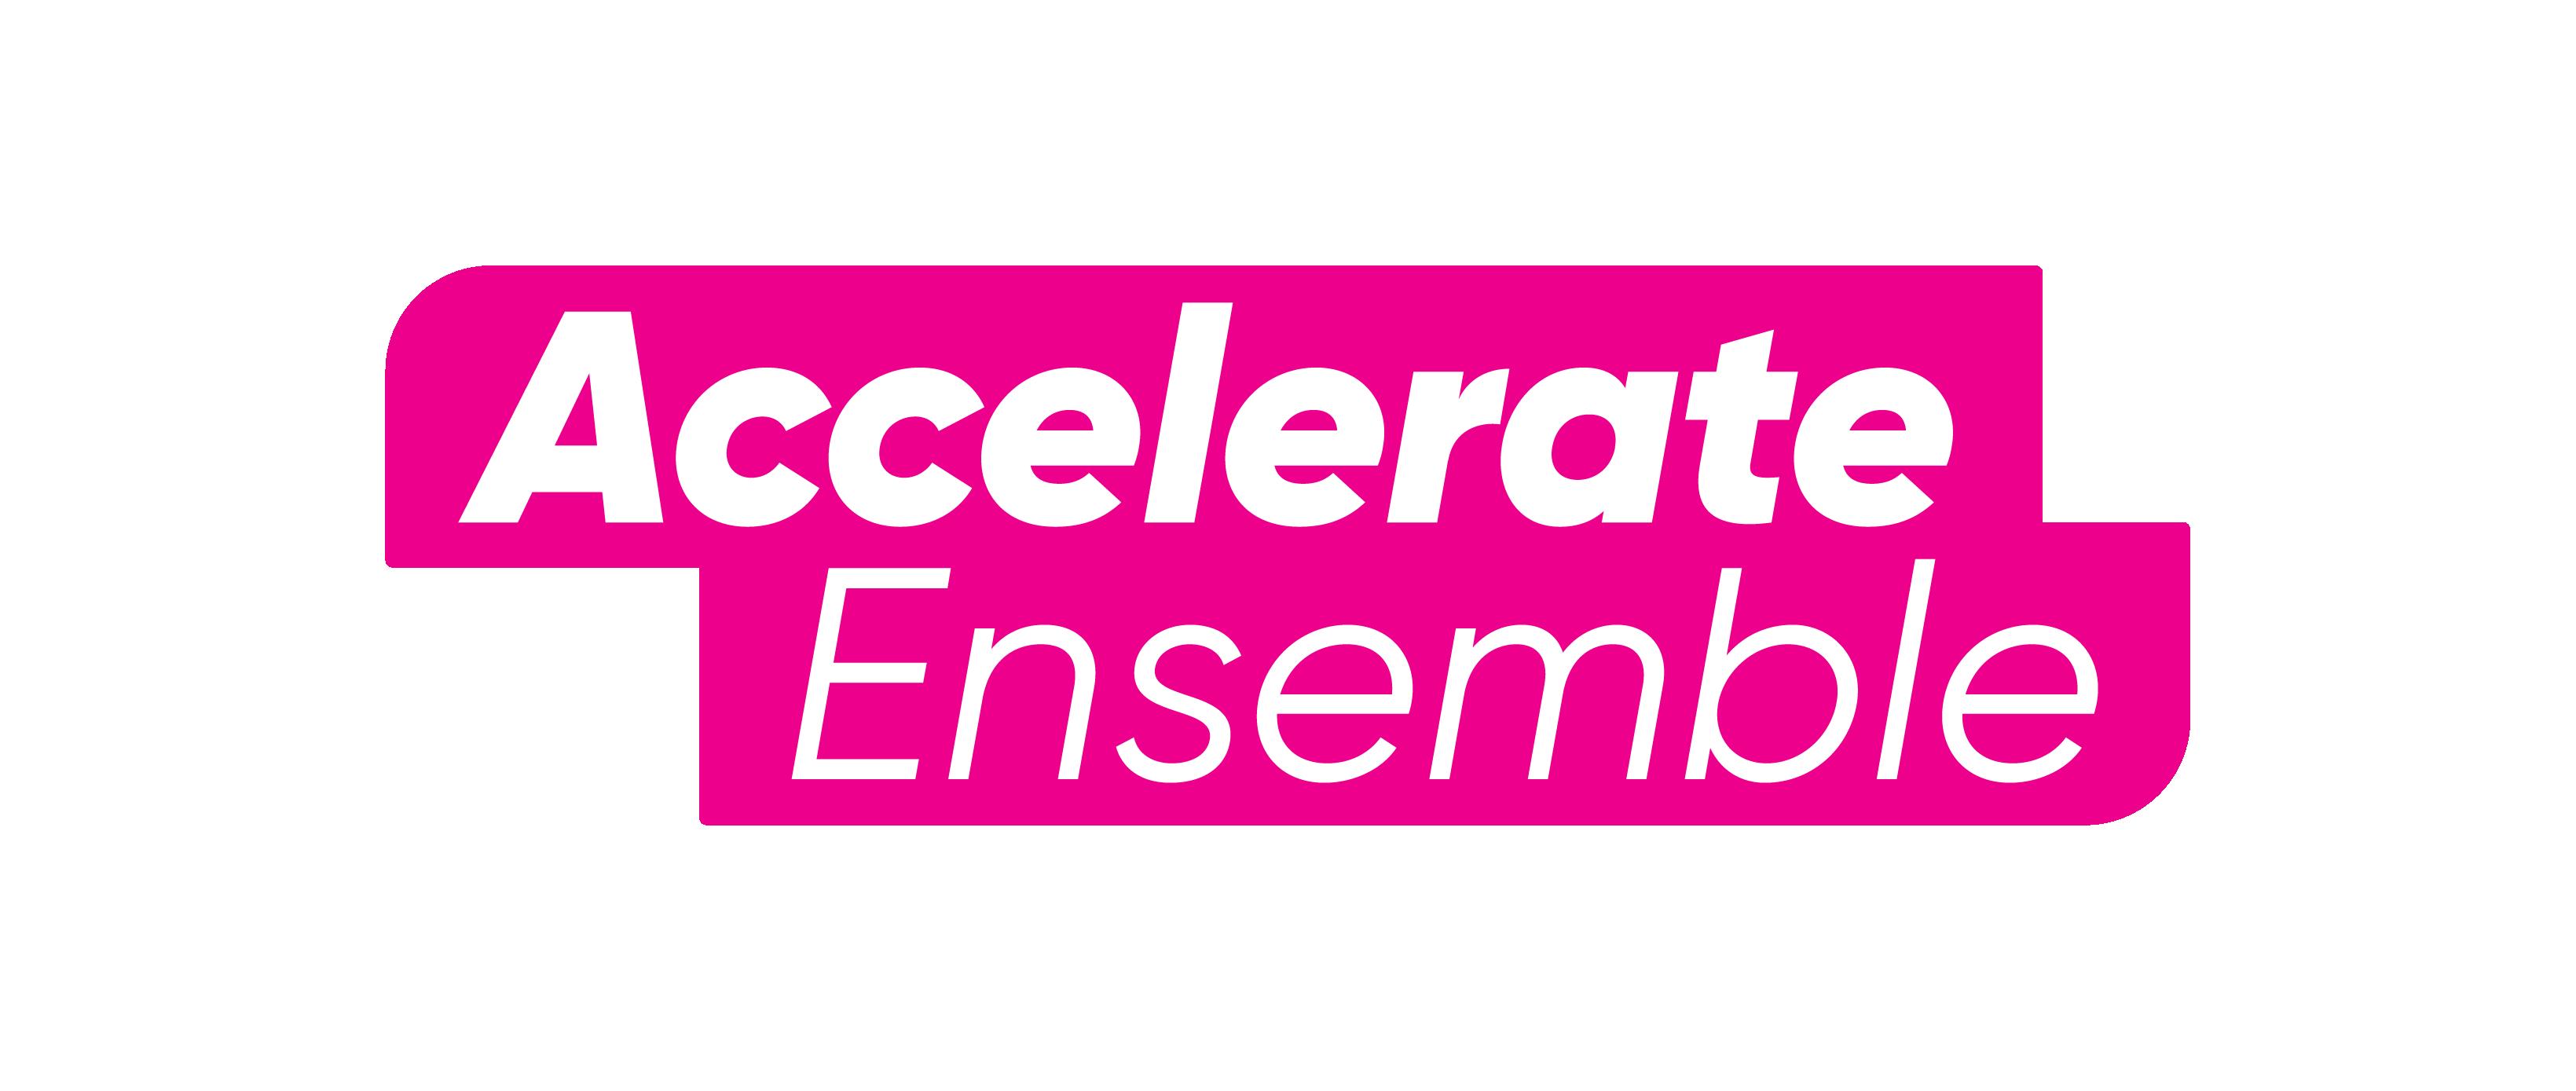 "Pink Logotype reads ""Accelerate Ensemble""."